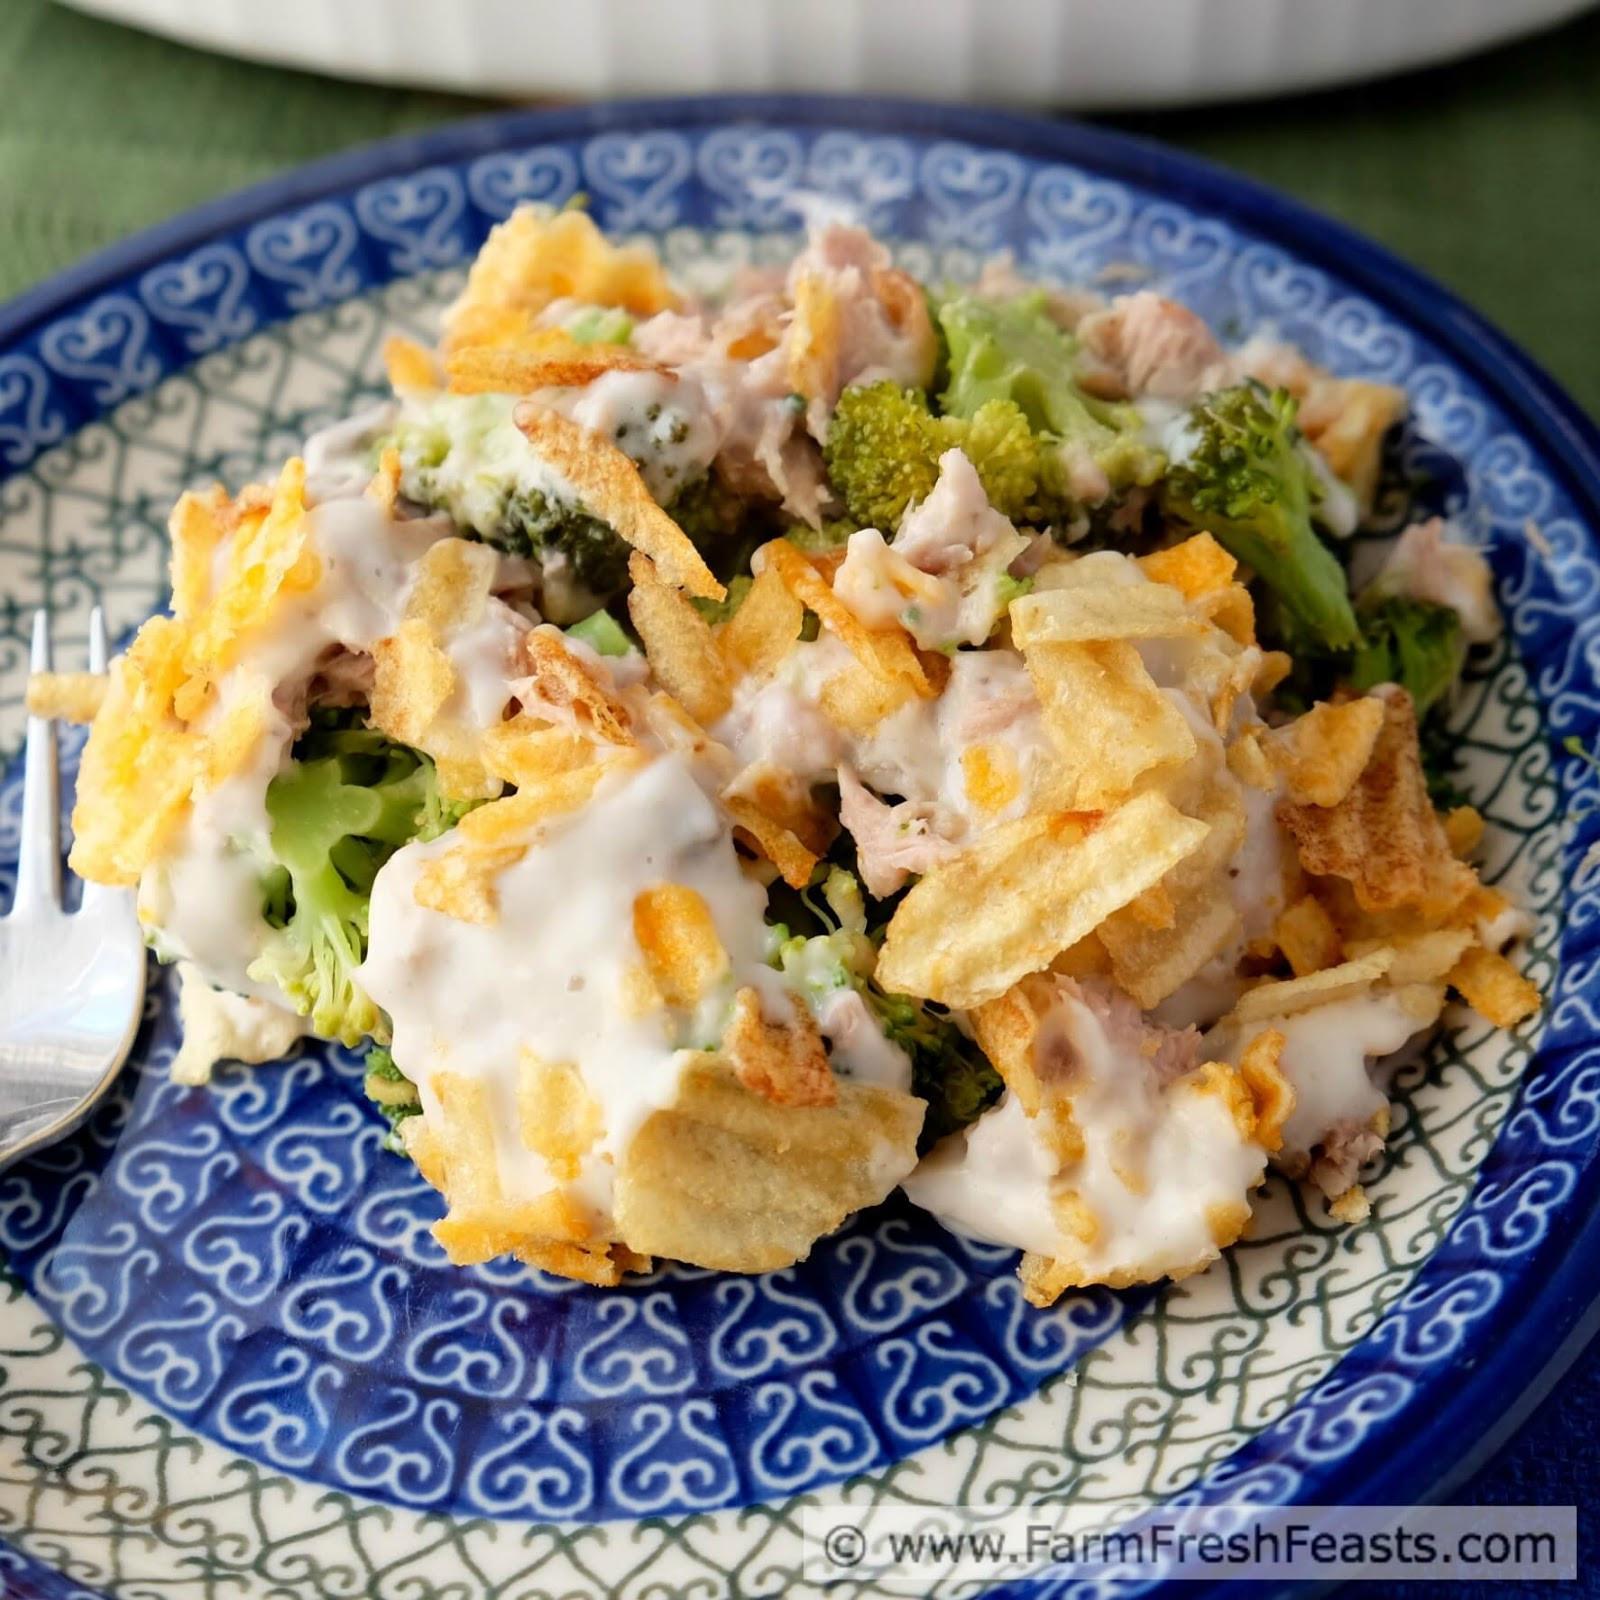 Tuna Noodle Casserole With Potato Chips  Farm Fresh Feasts Tuna Broccoli Casserole with Potato